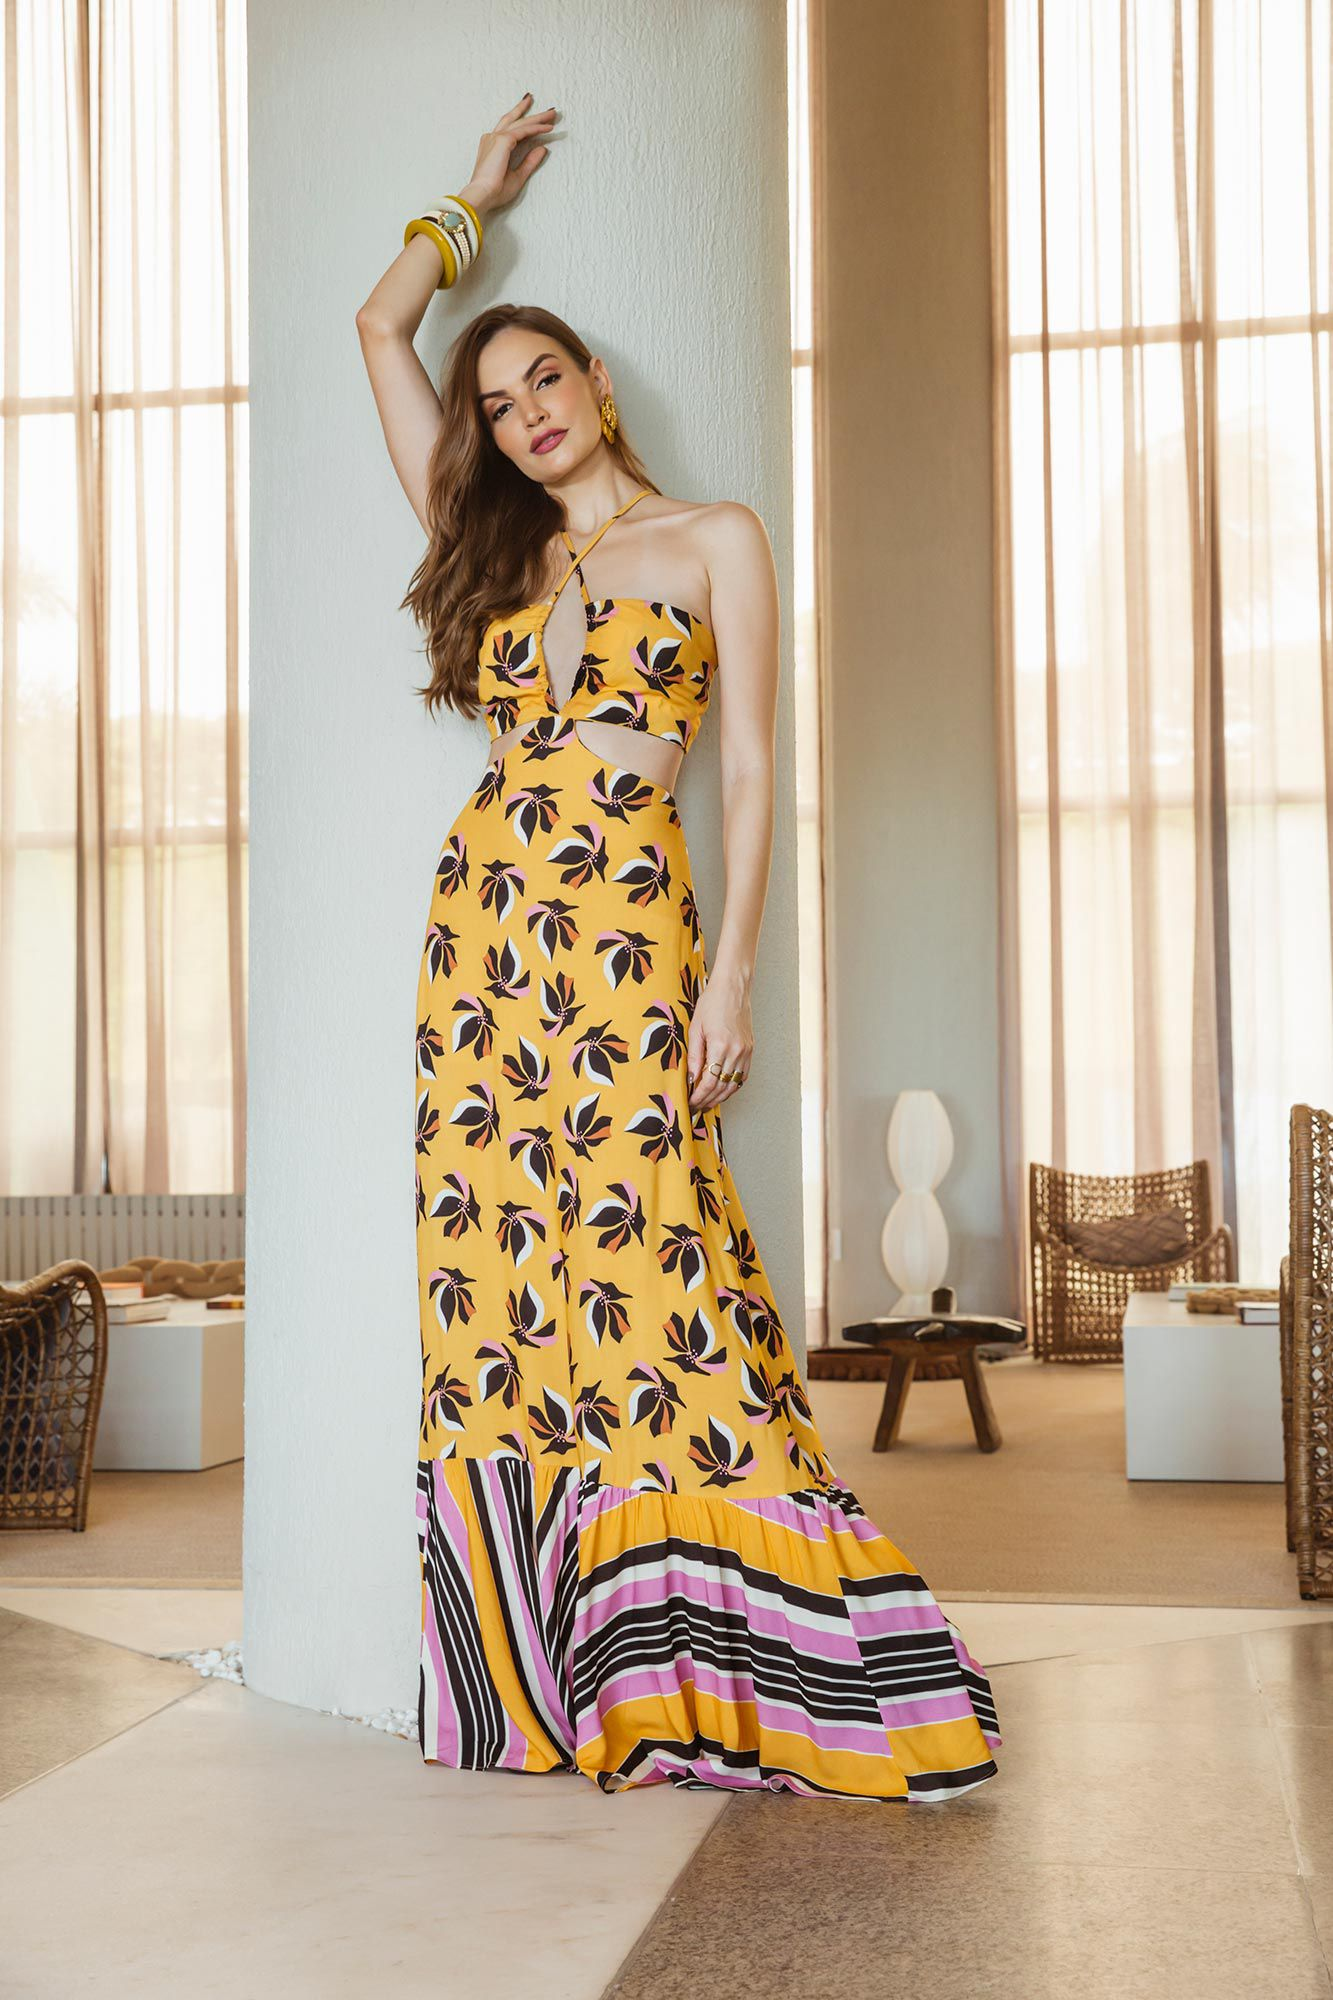 d230373f56 Vestido Longo Mix Estampa Floral e Listras - VANKOKE - Moda Feminina ...